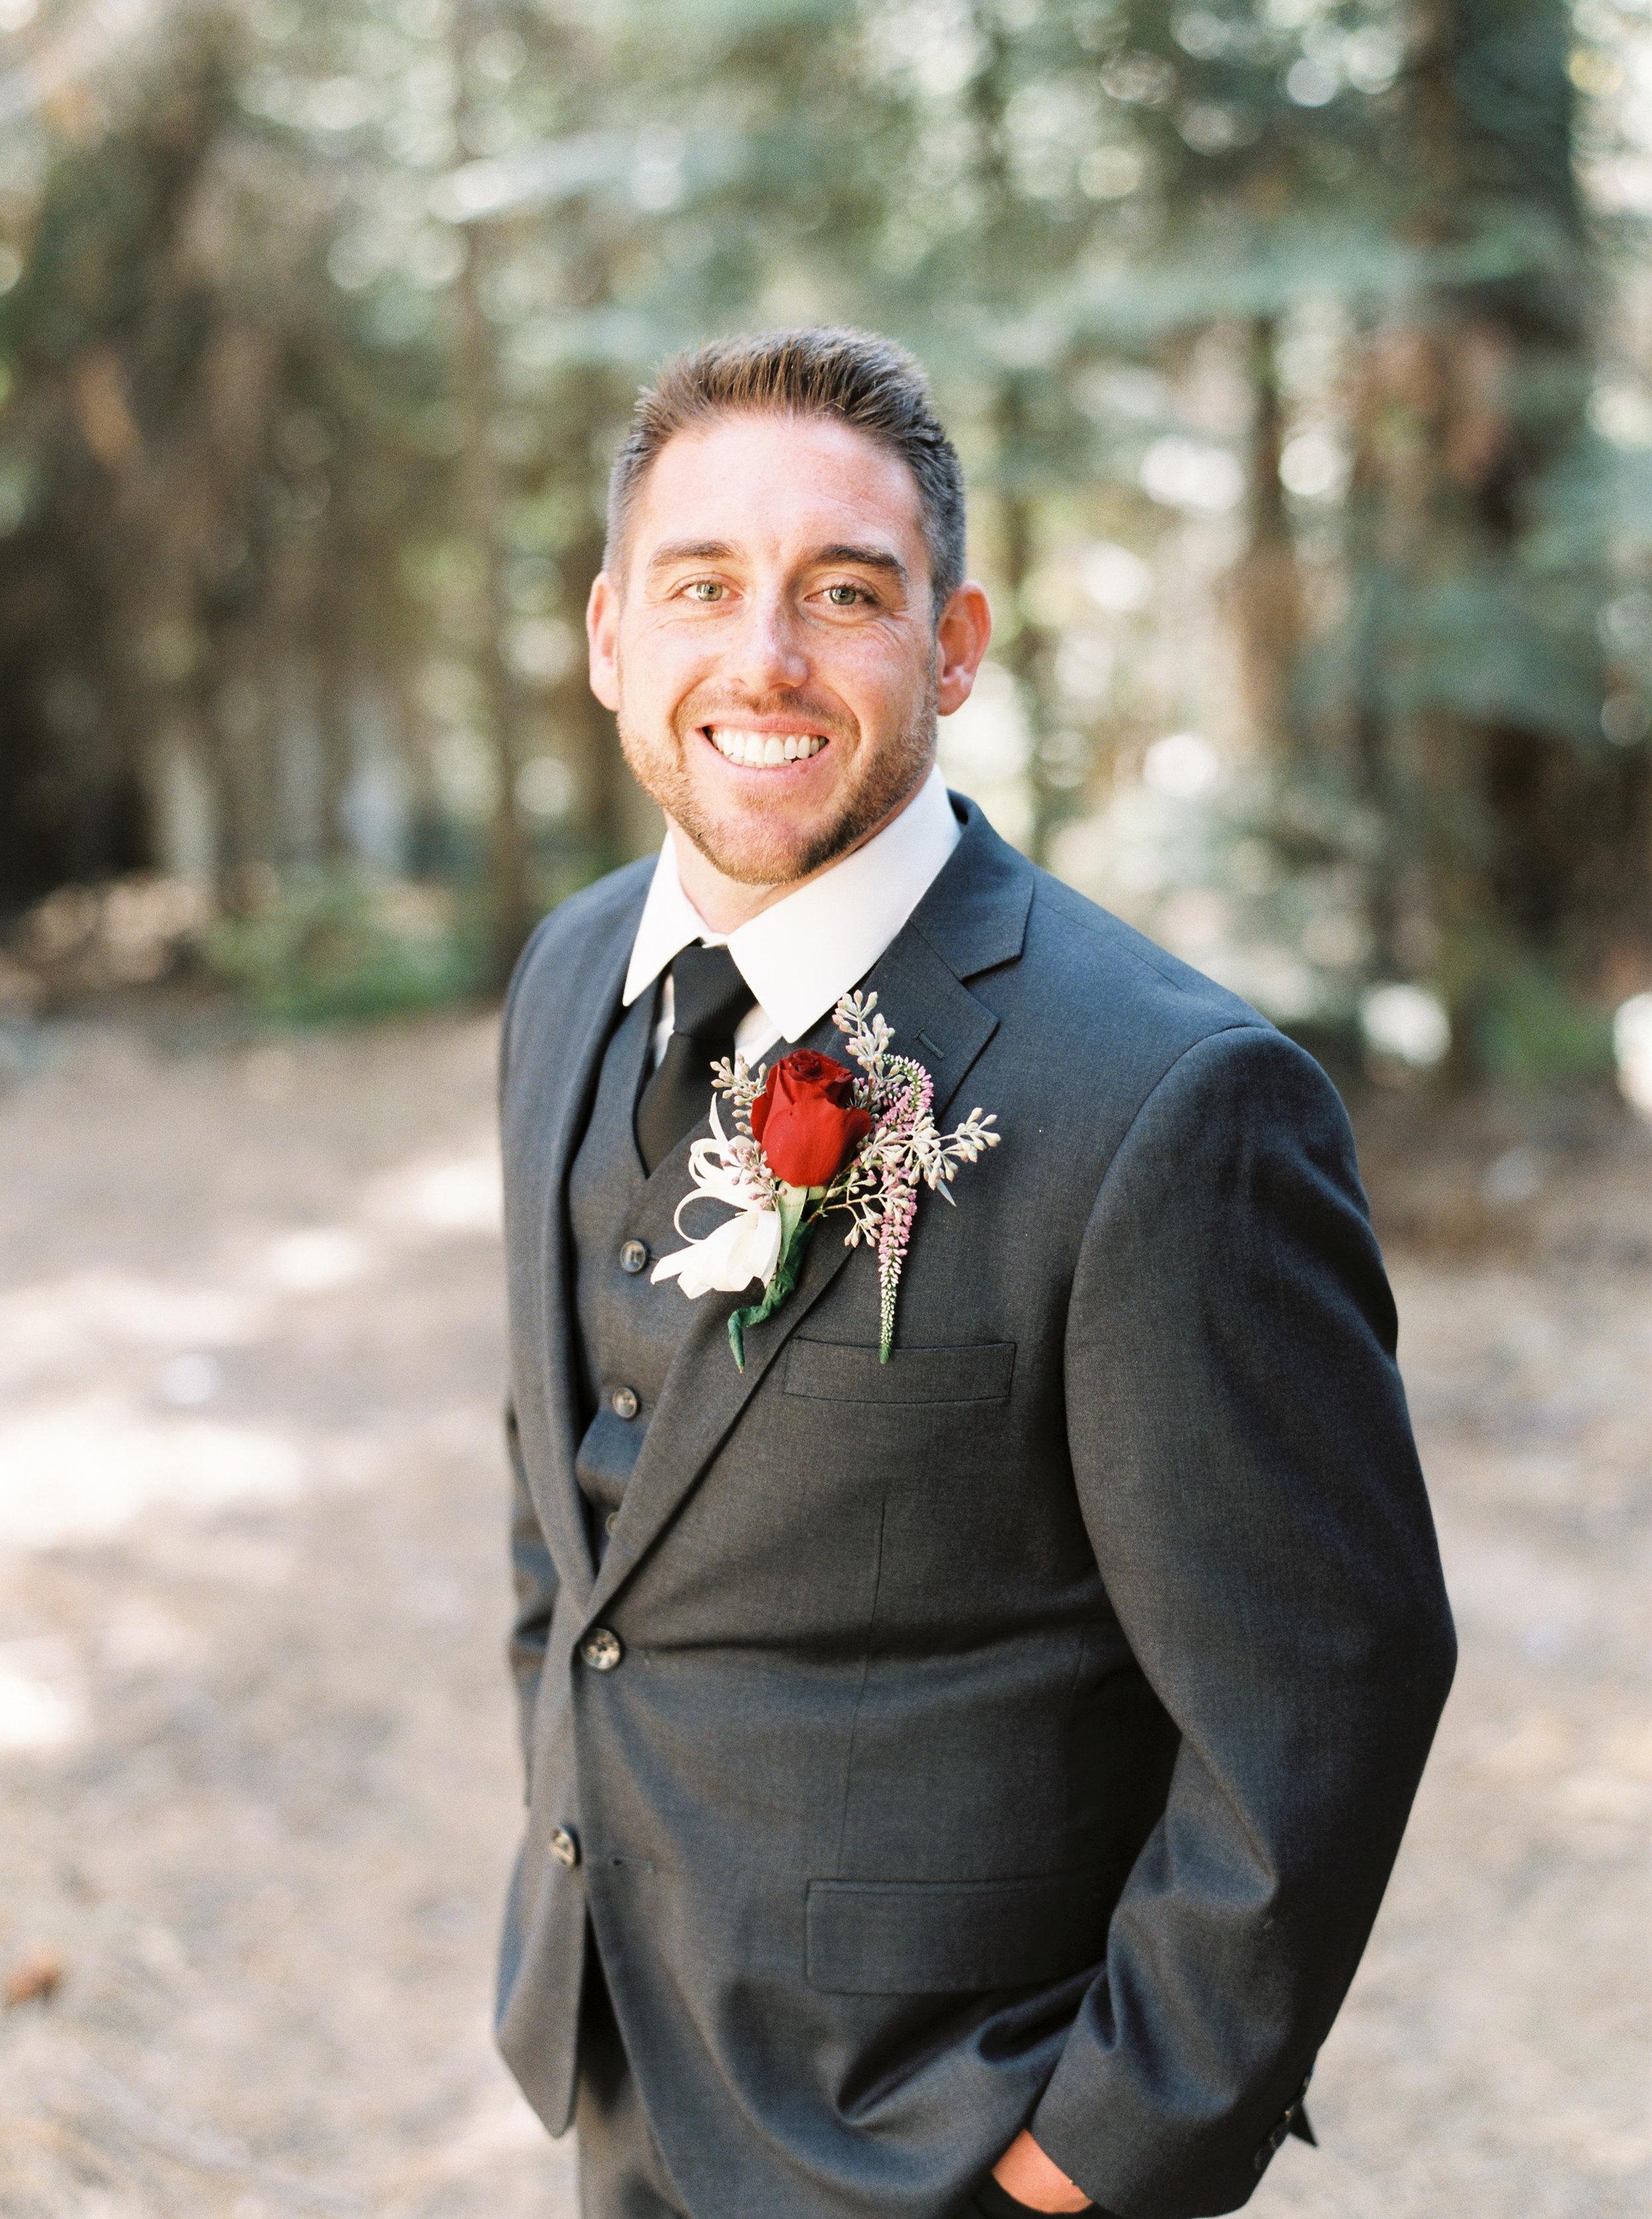 Tenaya-lodge-wedding-at-yosemite-national-park-california-60.jpg